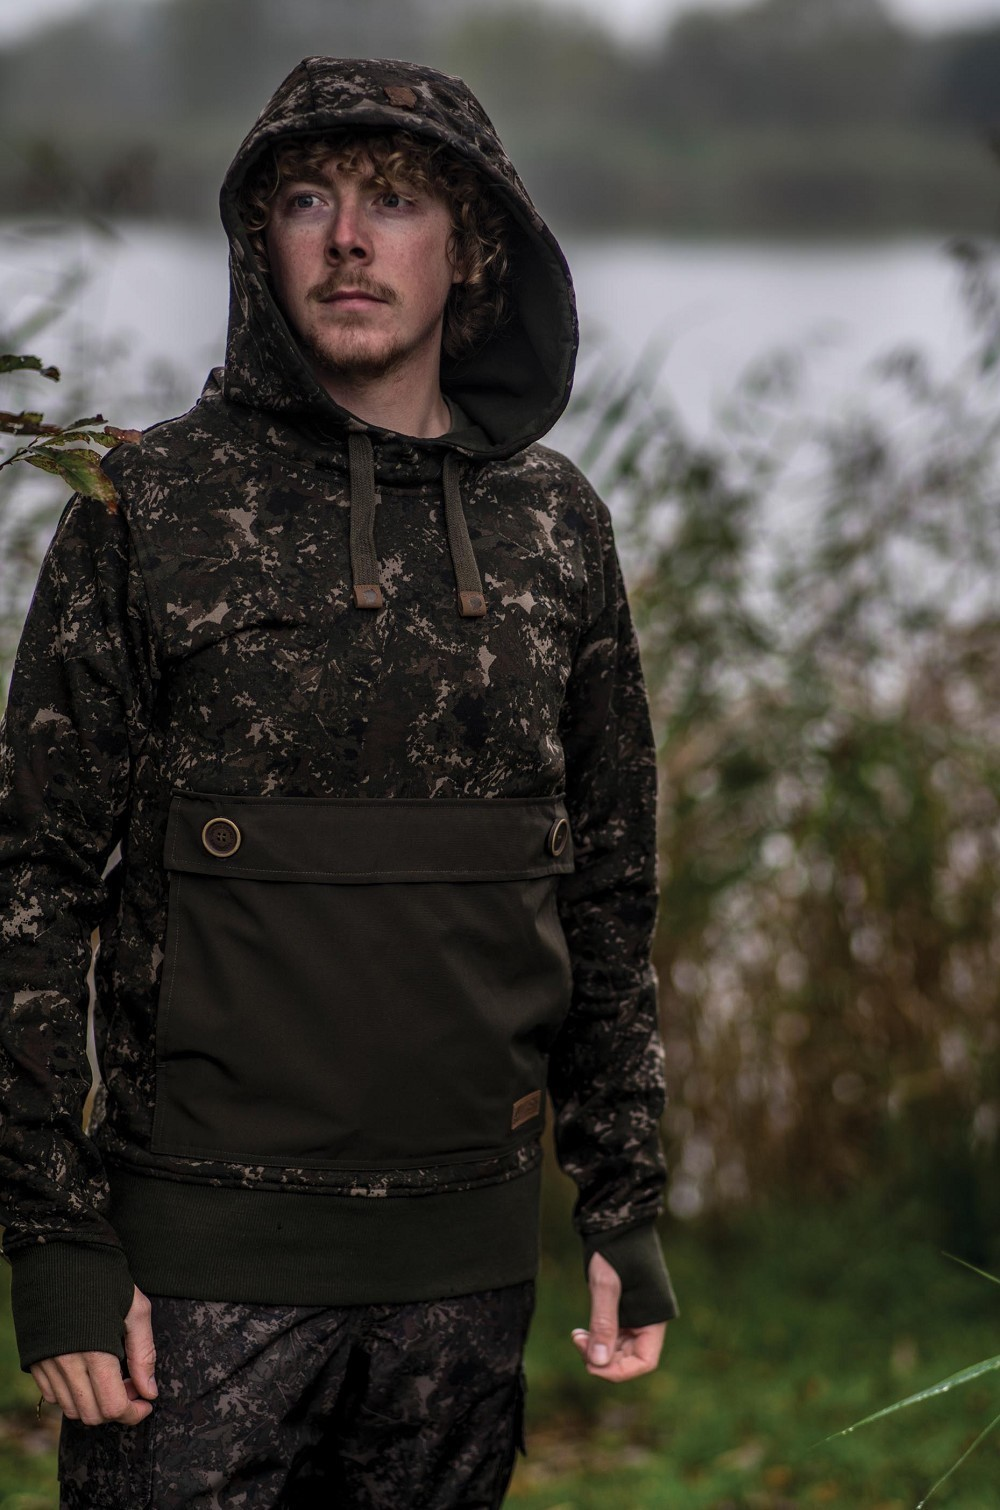 Nash ZT Subterranean Camo Hoody Carp Fishing Clothing